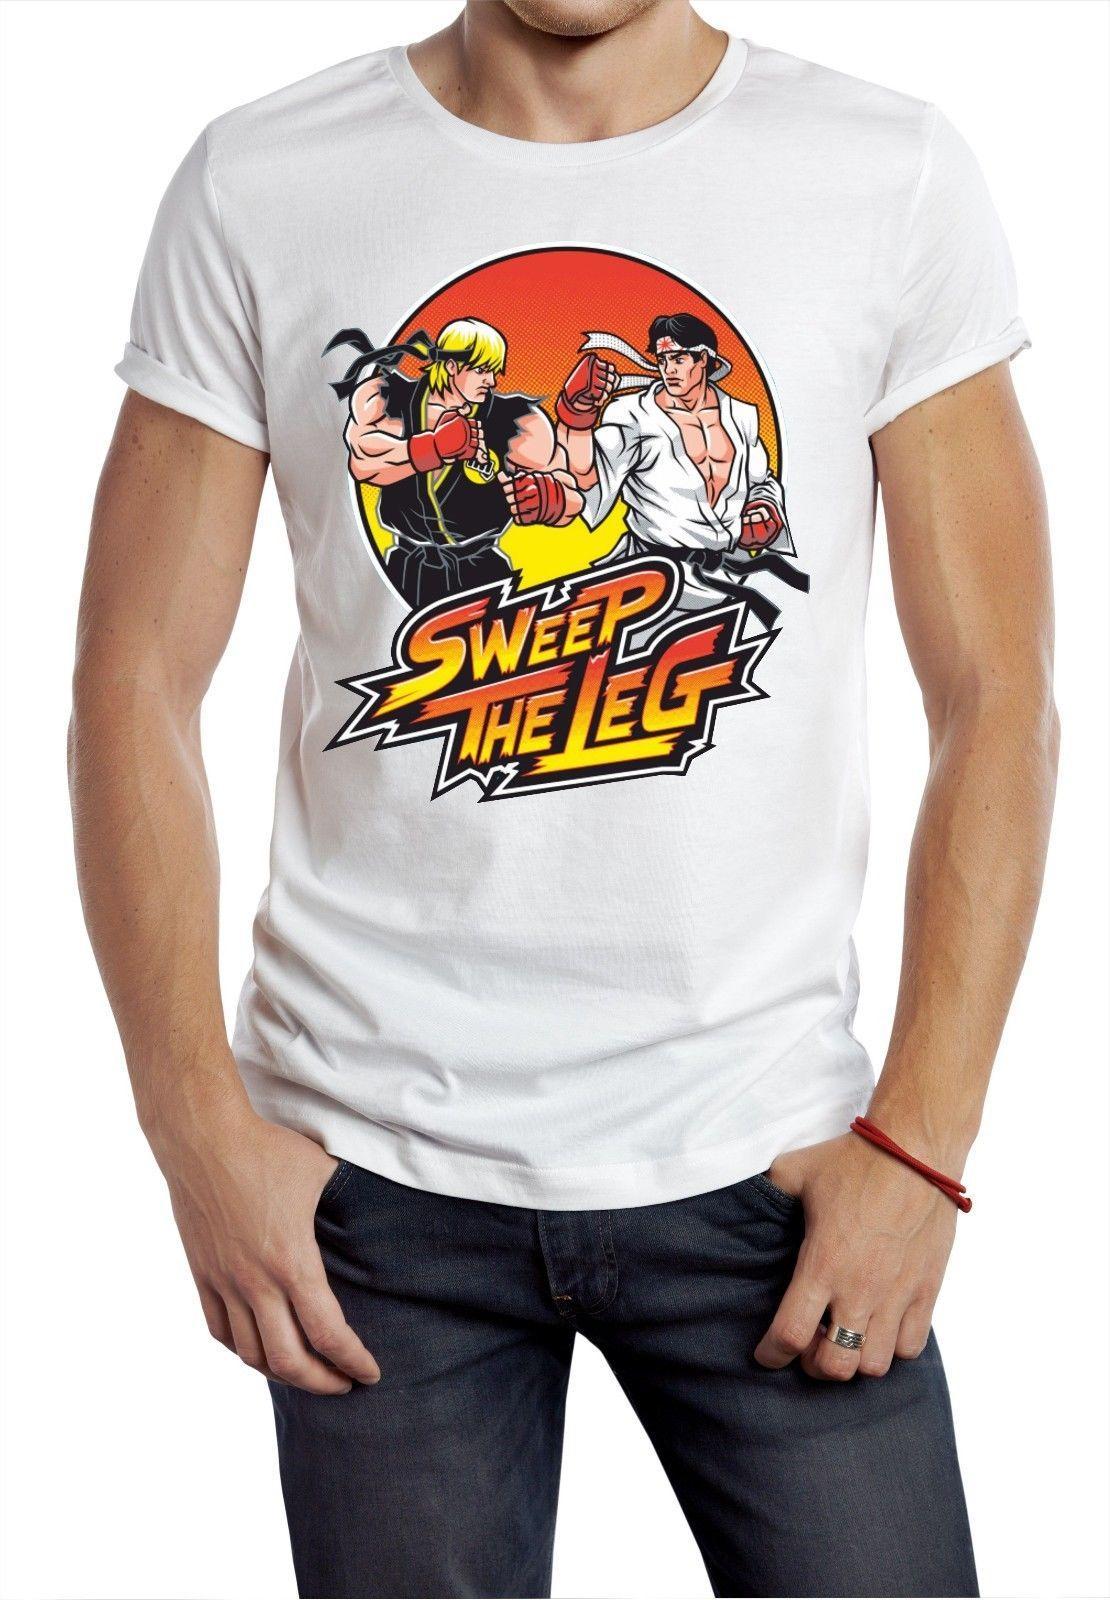 b59a6108 Sweep The Leg T Shirt Karate Kid Cobra Ken Ryu Street Fighter Game ...